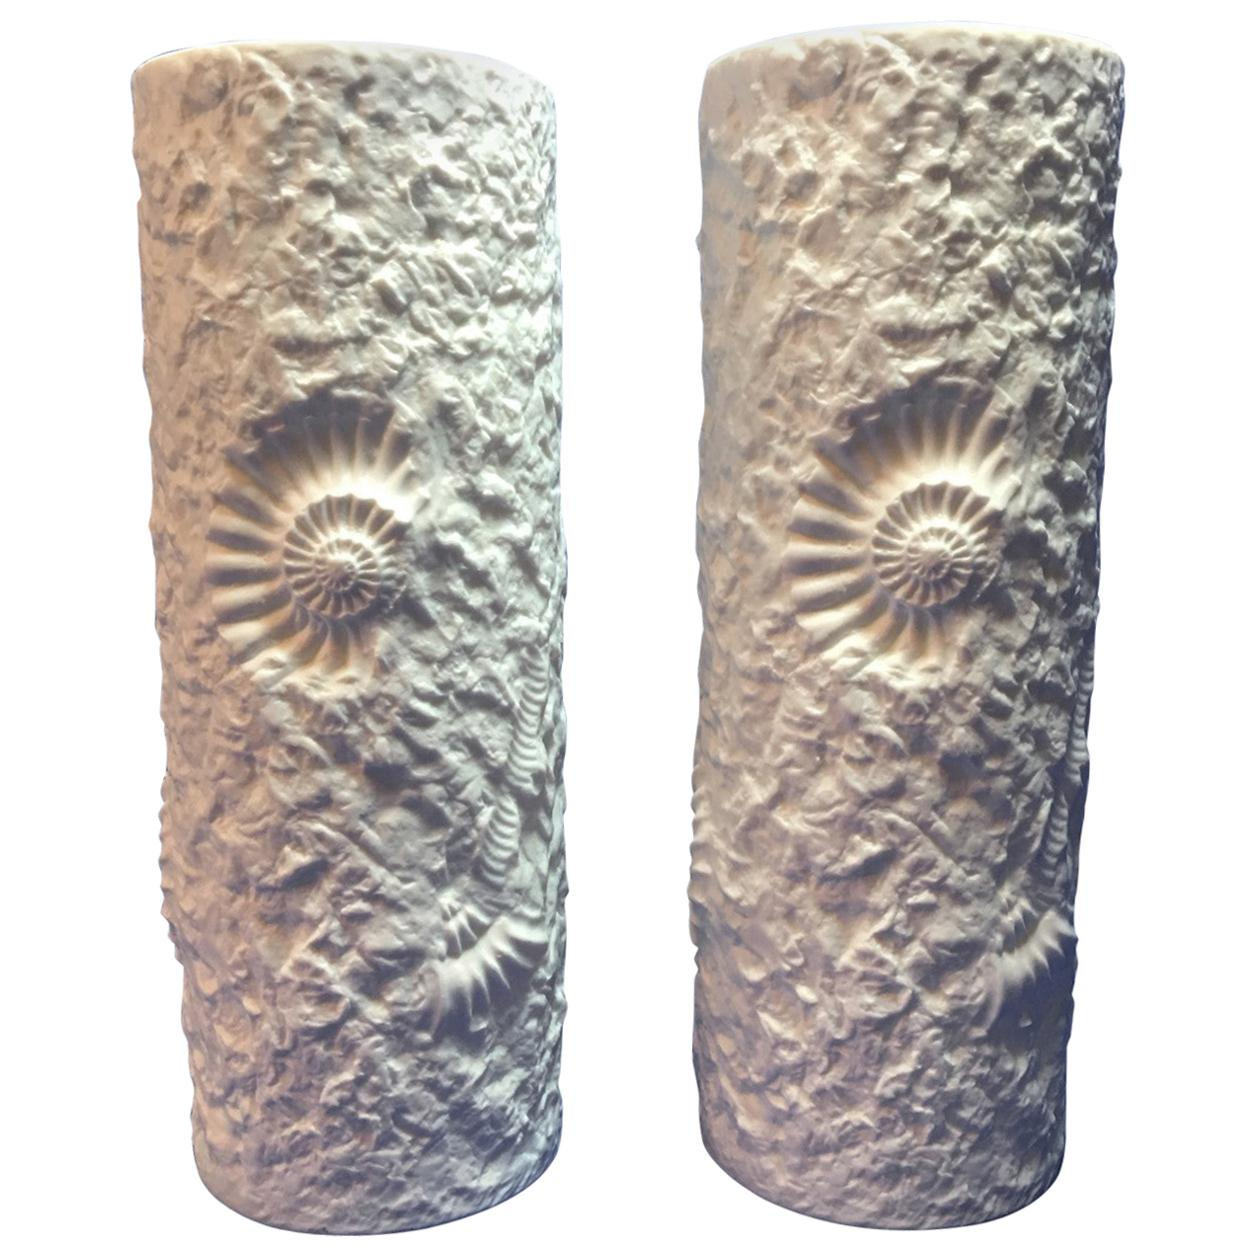 Lovely Pair of White Matte Fossil Rock Vases by Kaiser of Germany